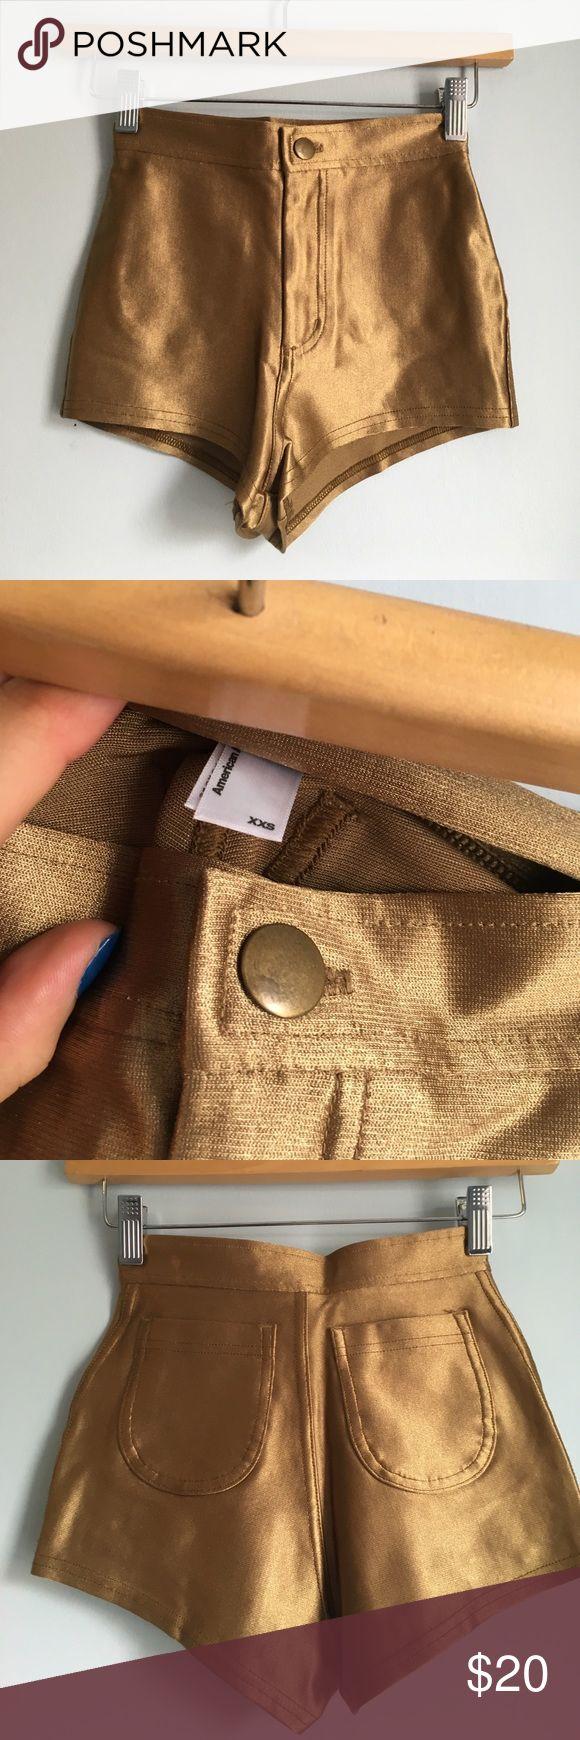 American apparel golf disco shorts Excellent condition. Super cute piece. American Apparel Shorts